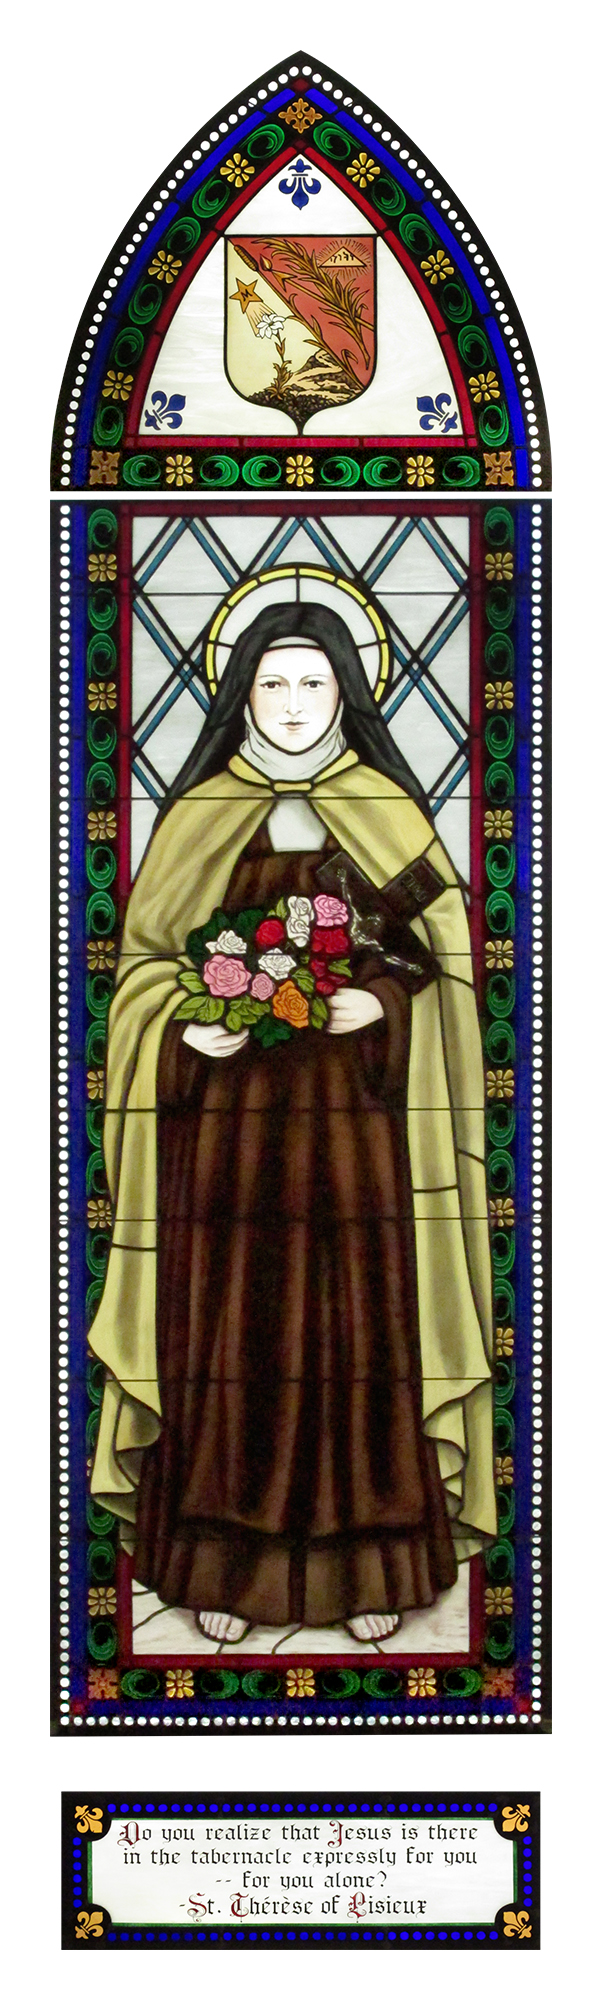 Our Lady of Solitude Monastery, Tonopah, AZ